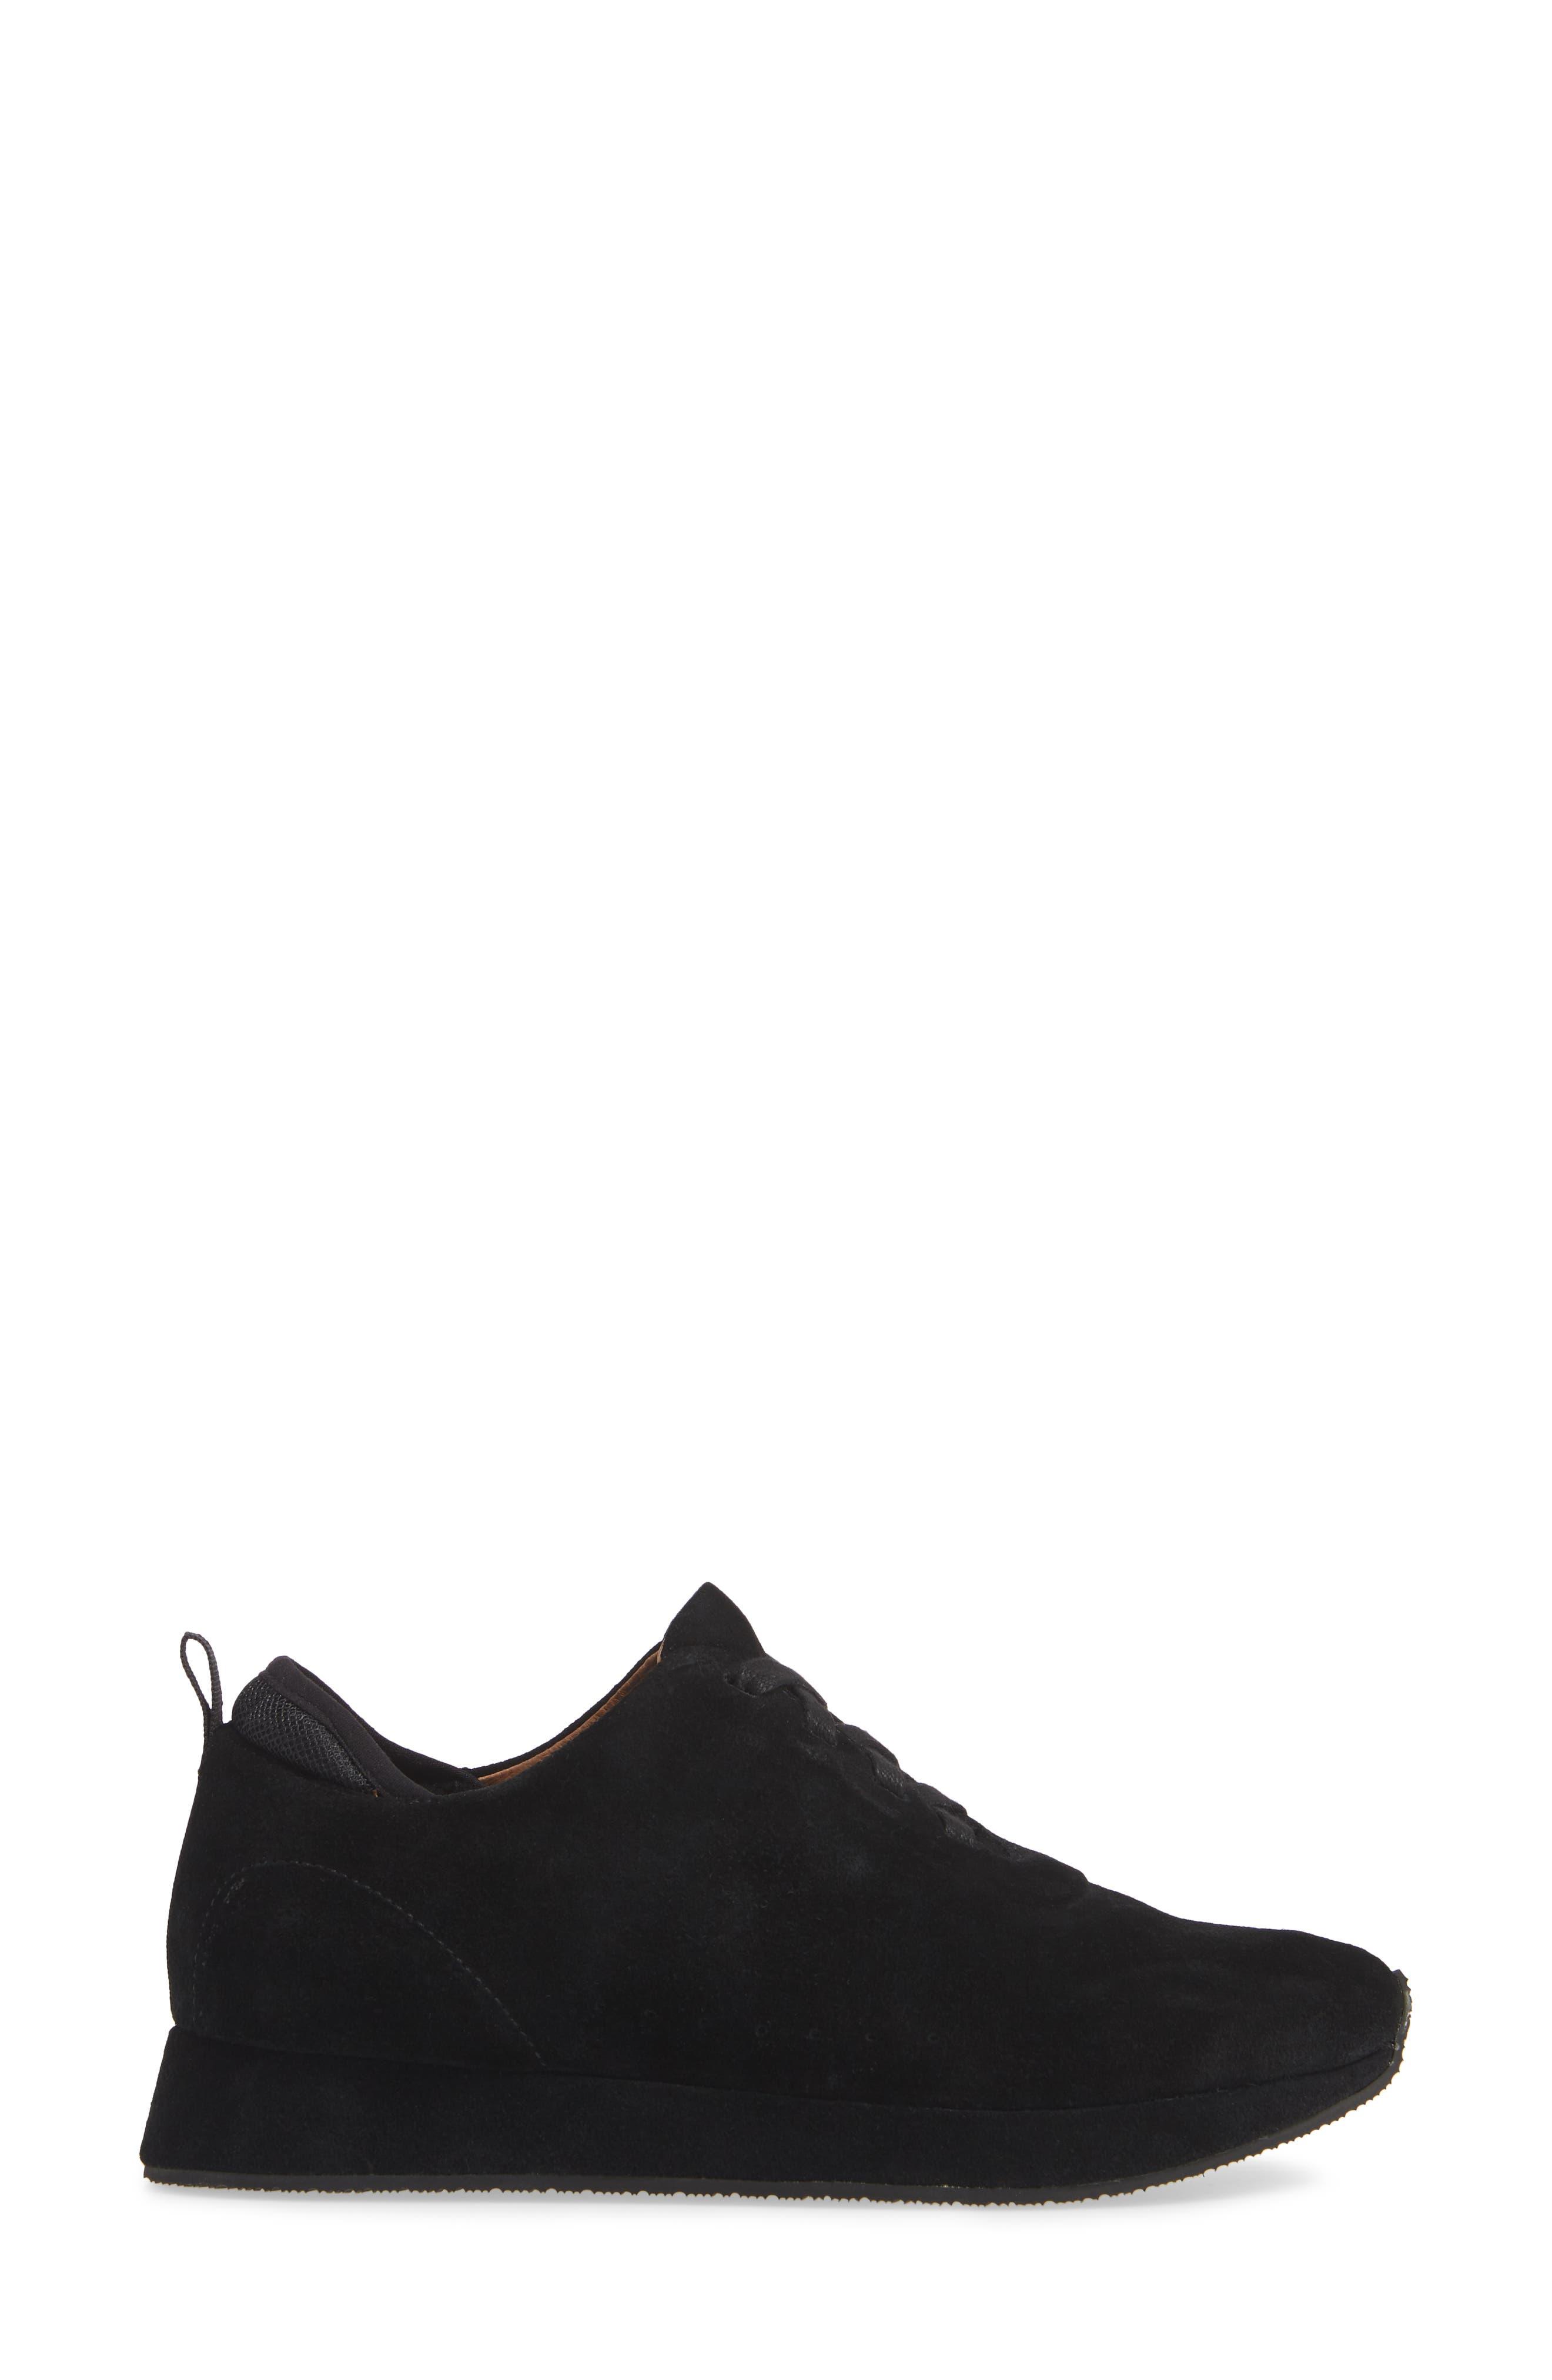 Mabel Sneaker,                             Alternate thumbnail 3, color,                             BLACK SUEDE